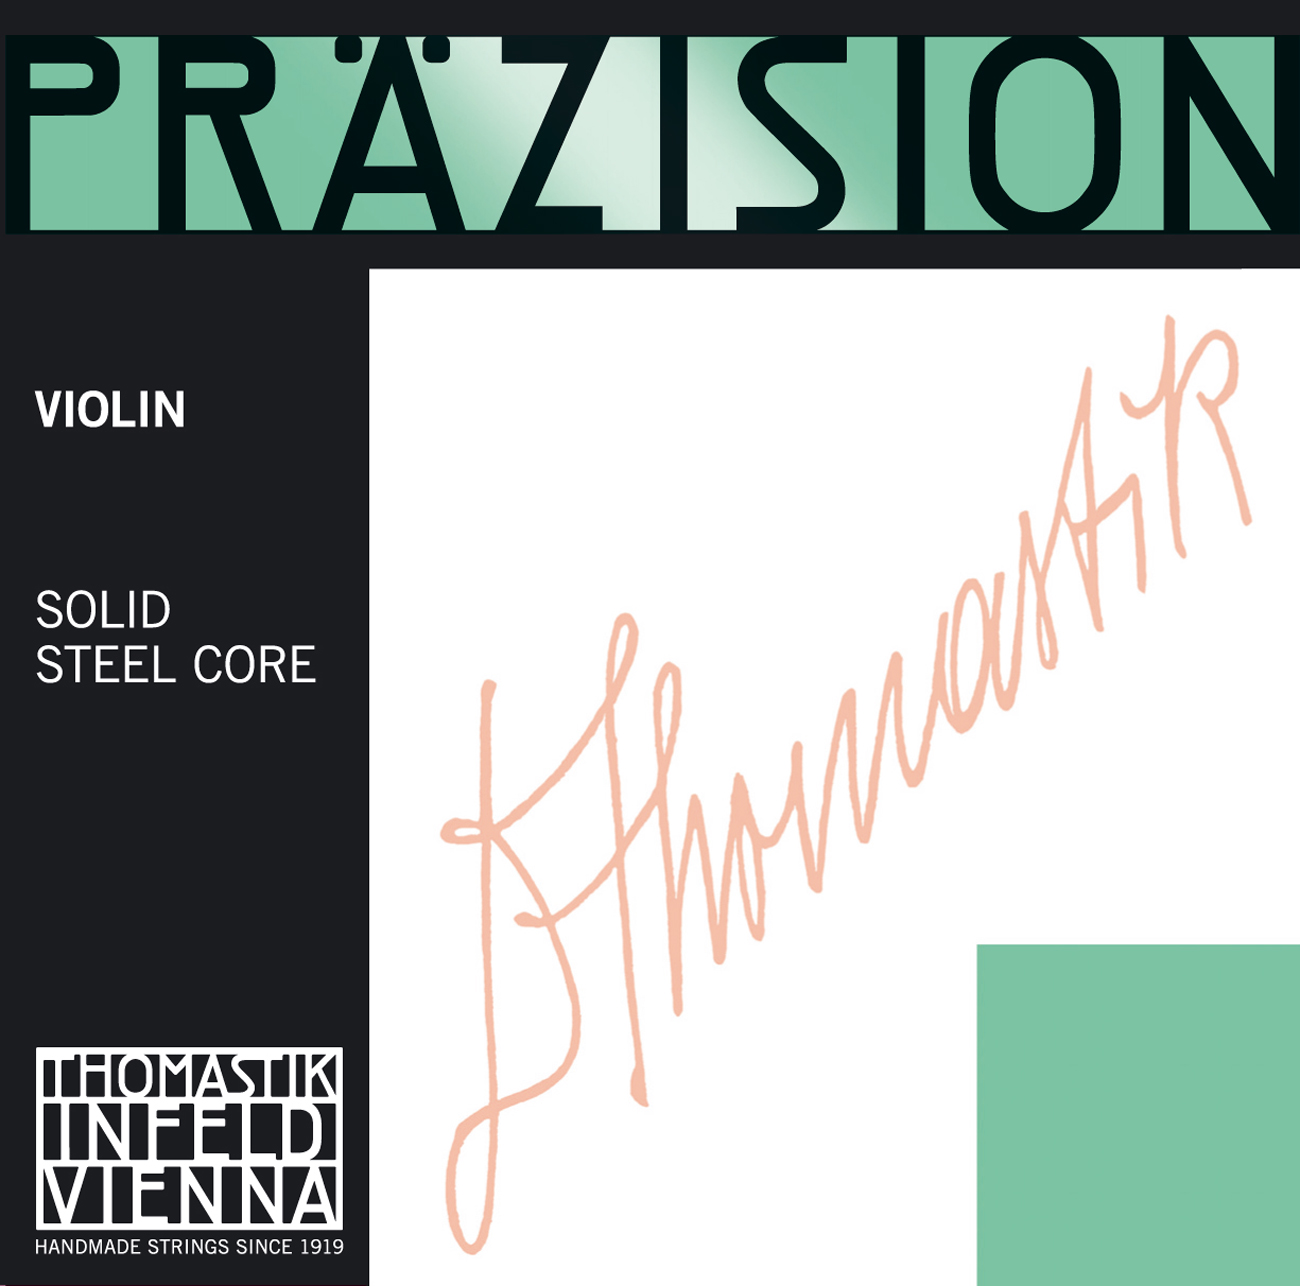 Precision Violin G Chrome 1/8 R